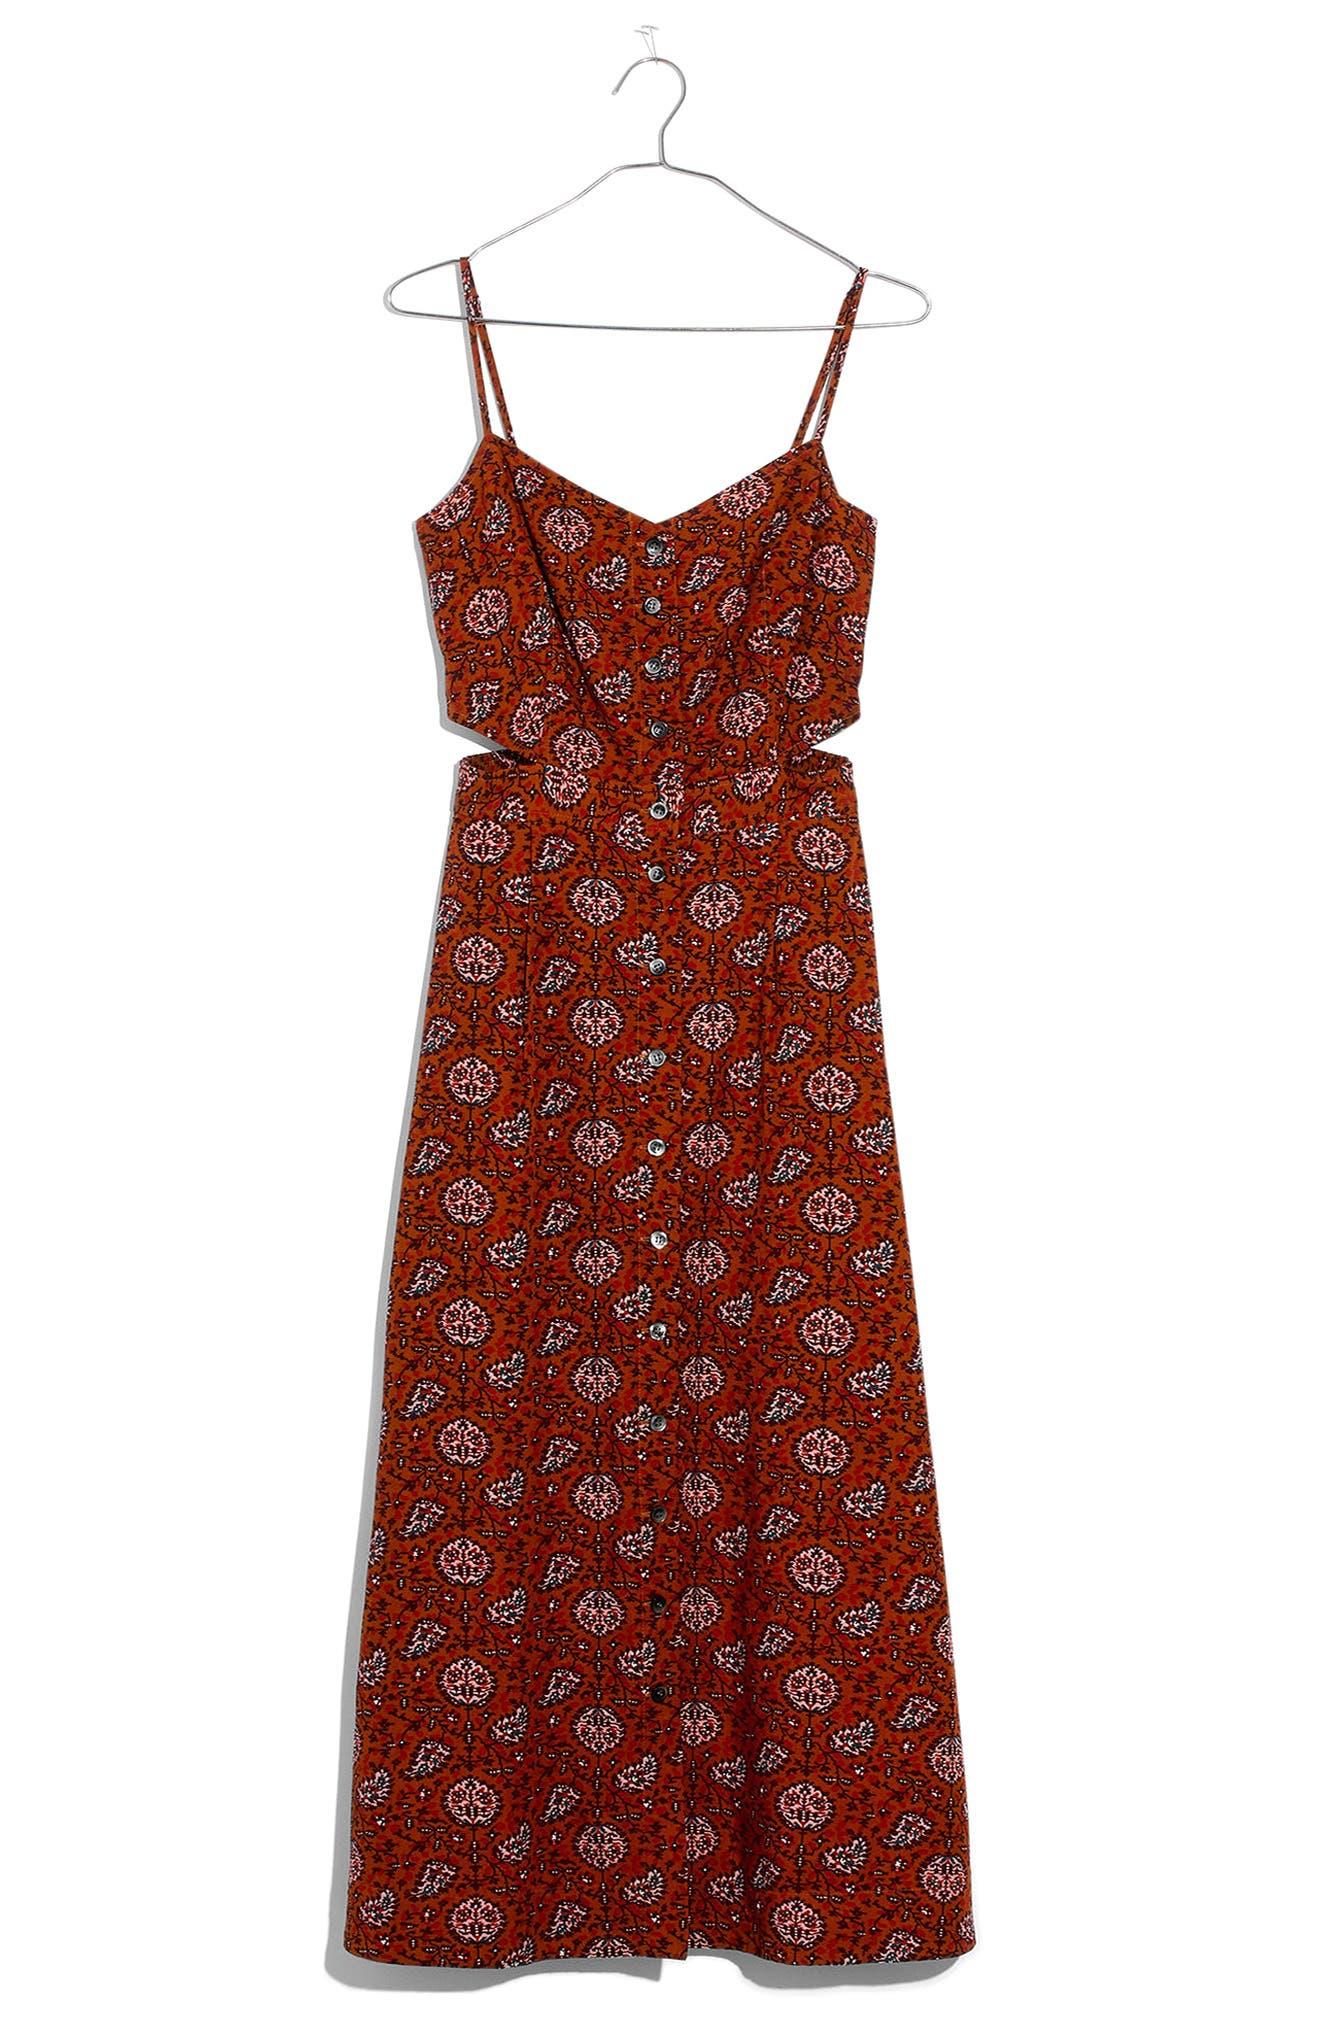 MADEWELL,                             Warm Paisley Cutout Camisole Midi Dress,                             Alternate thumbnail 4, color,                             200